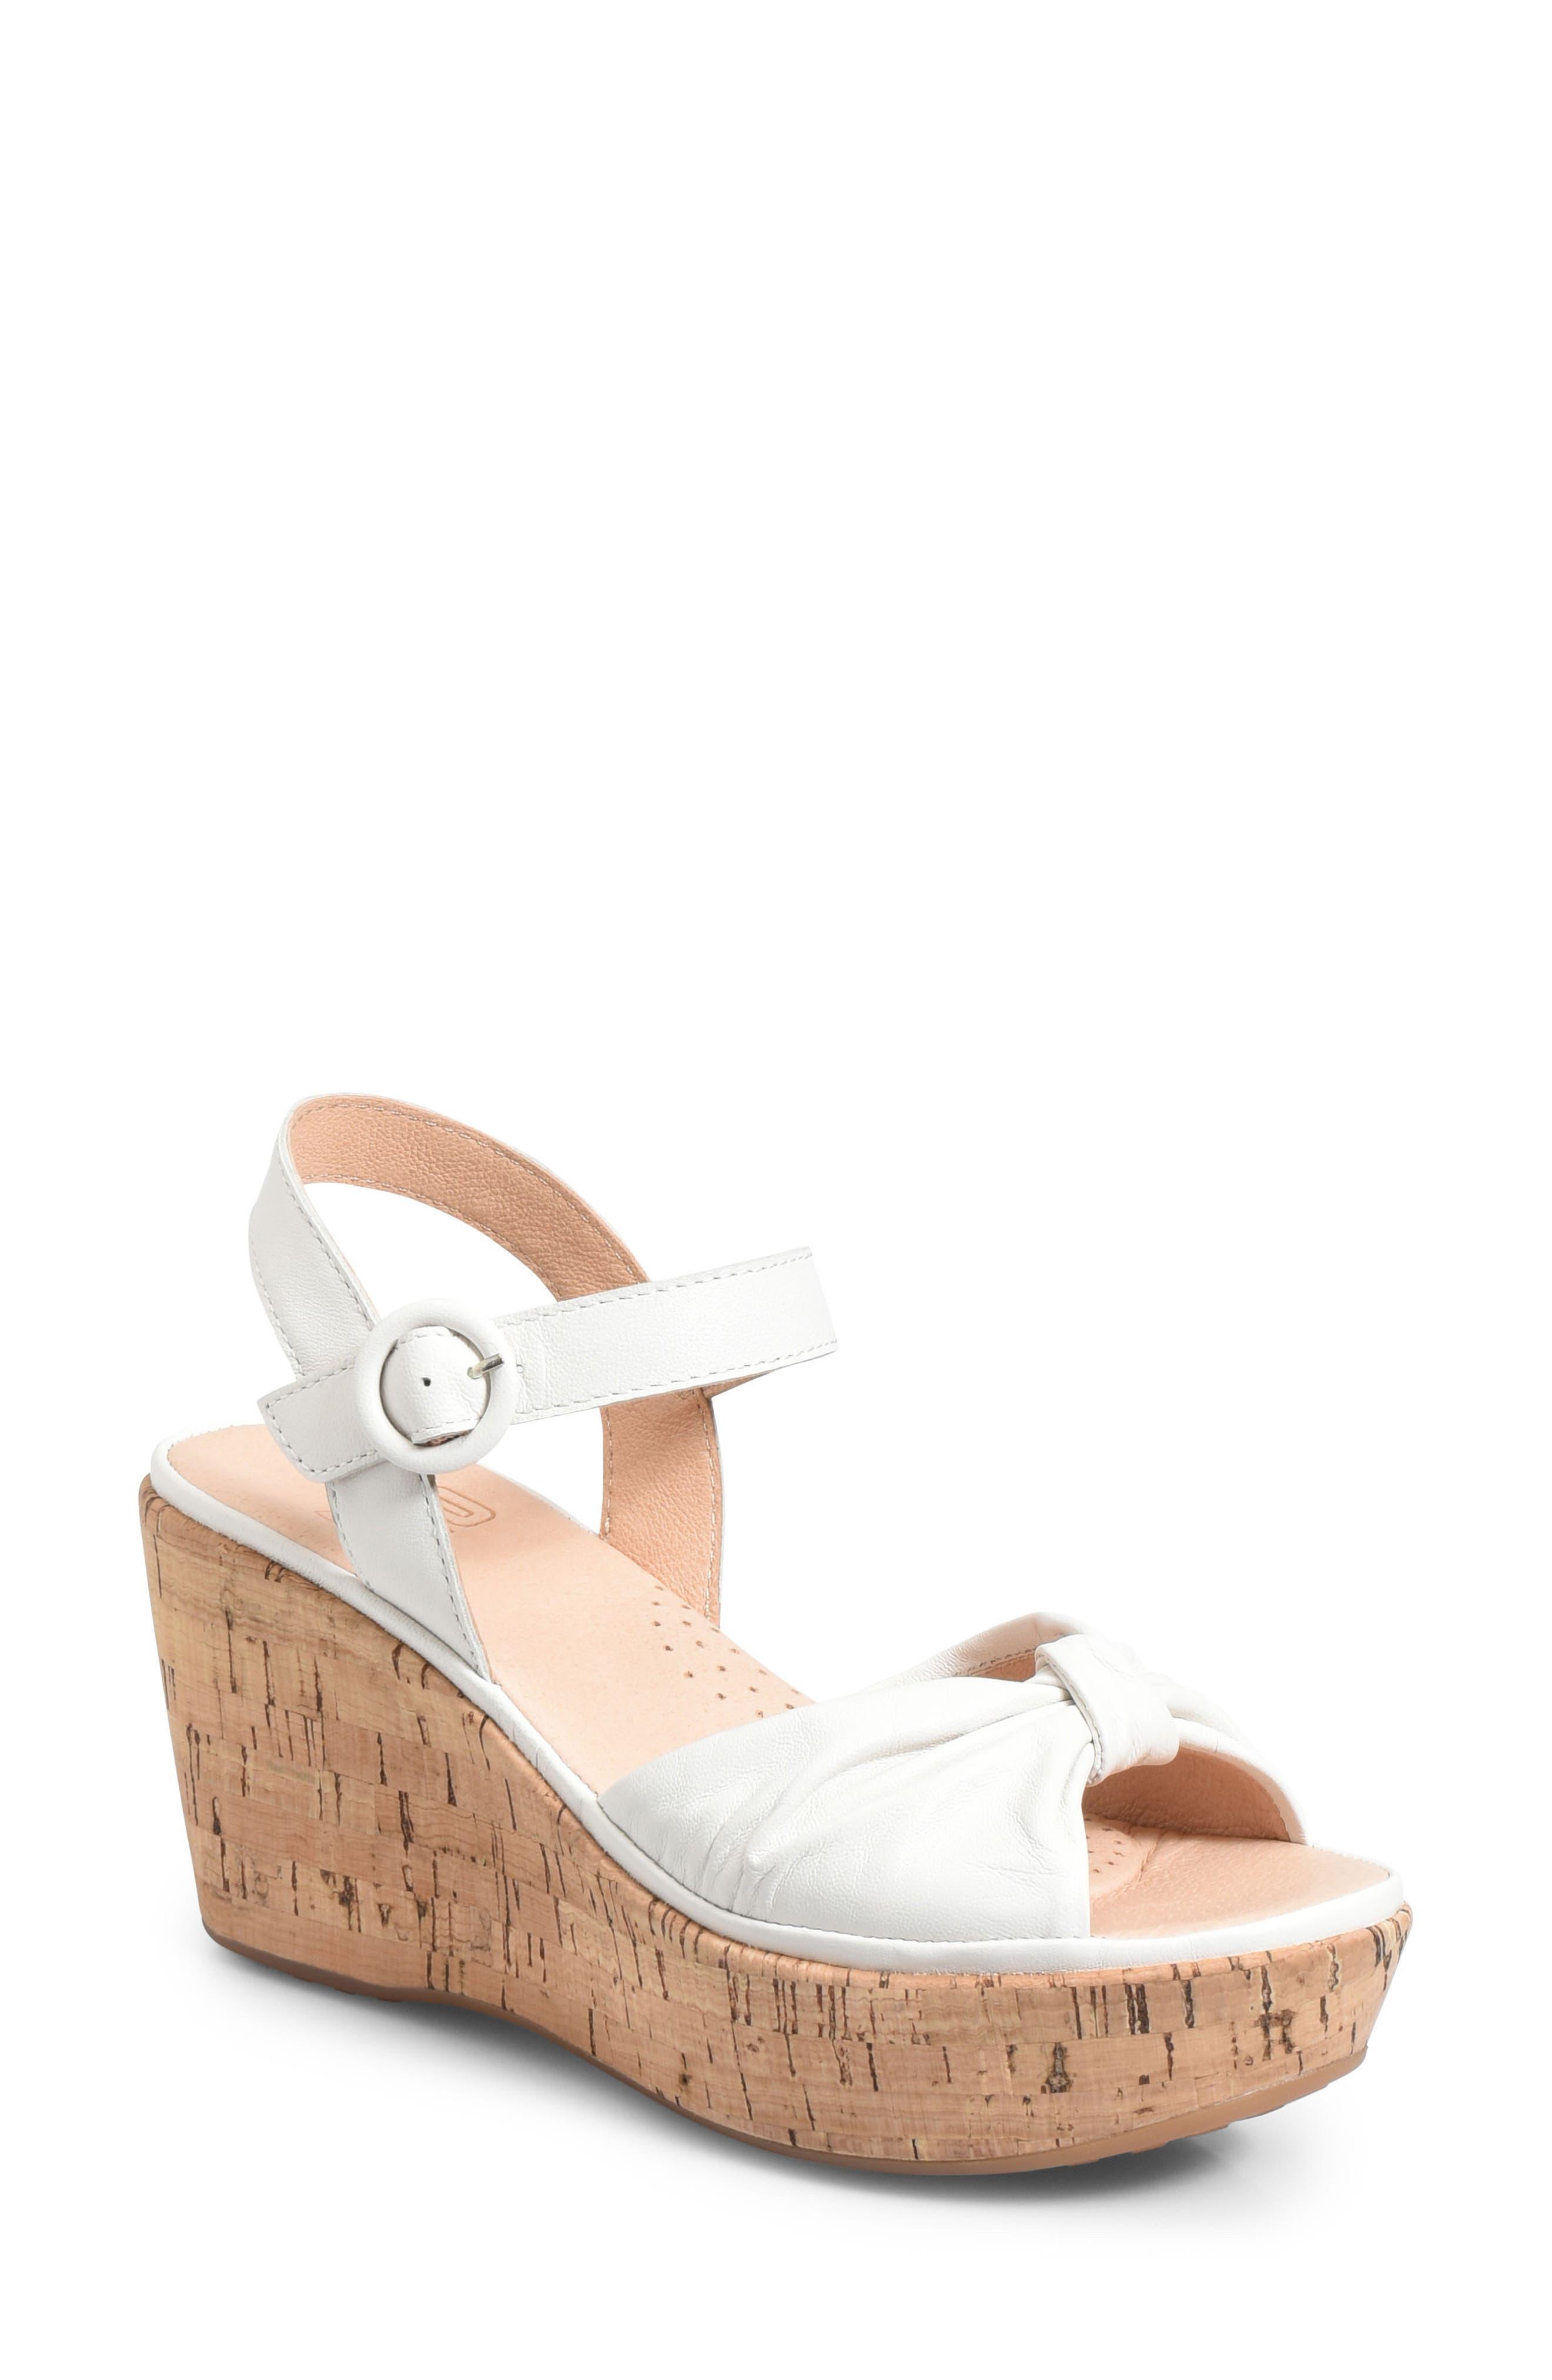 Ono Heavenly Platform Wedge Sandal, White